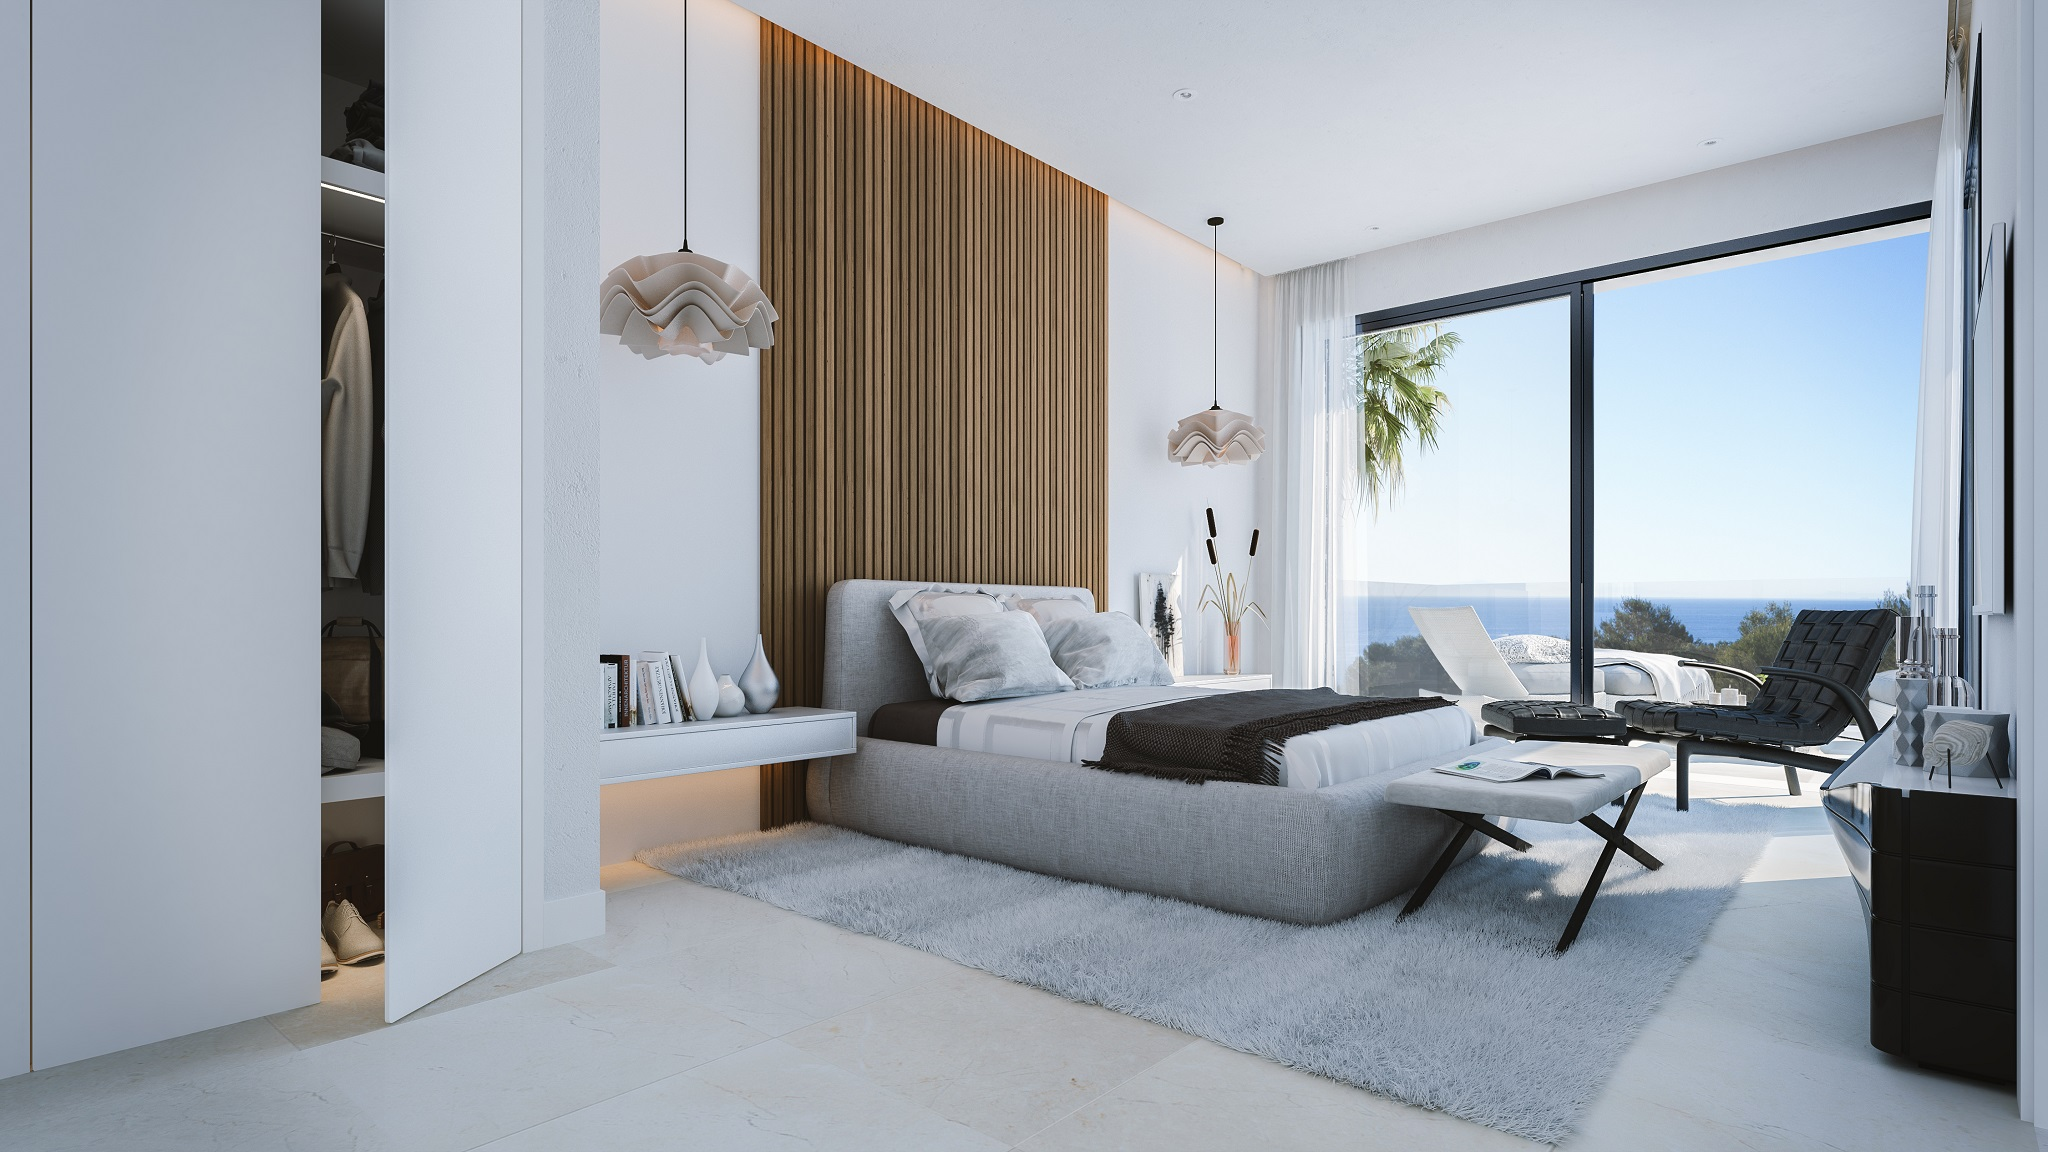 Impresionante villa moderna en Marbella este